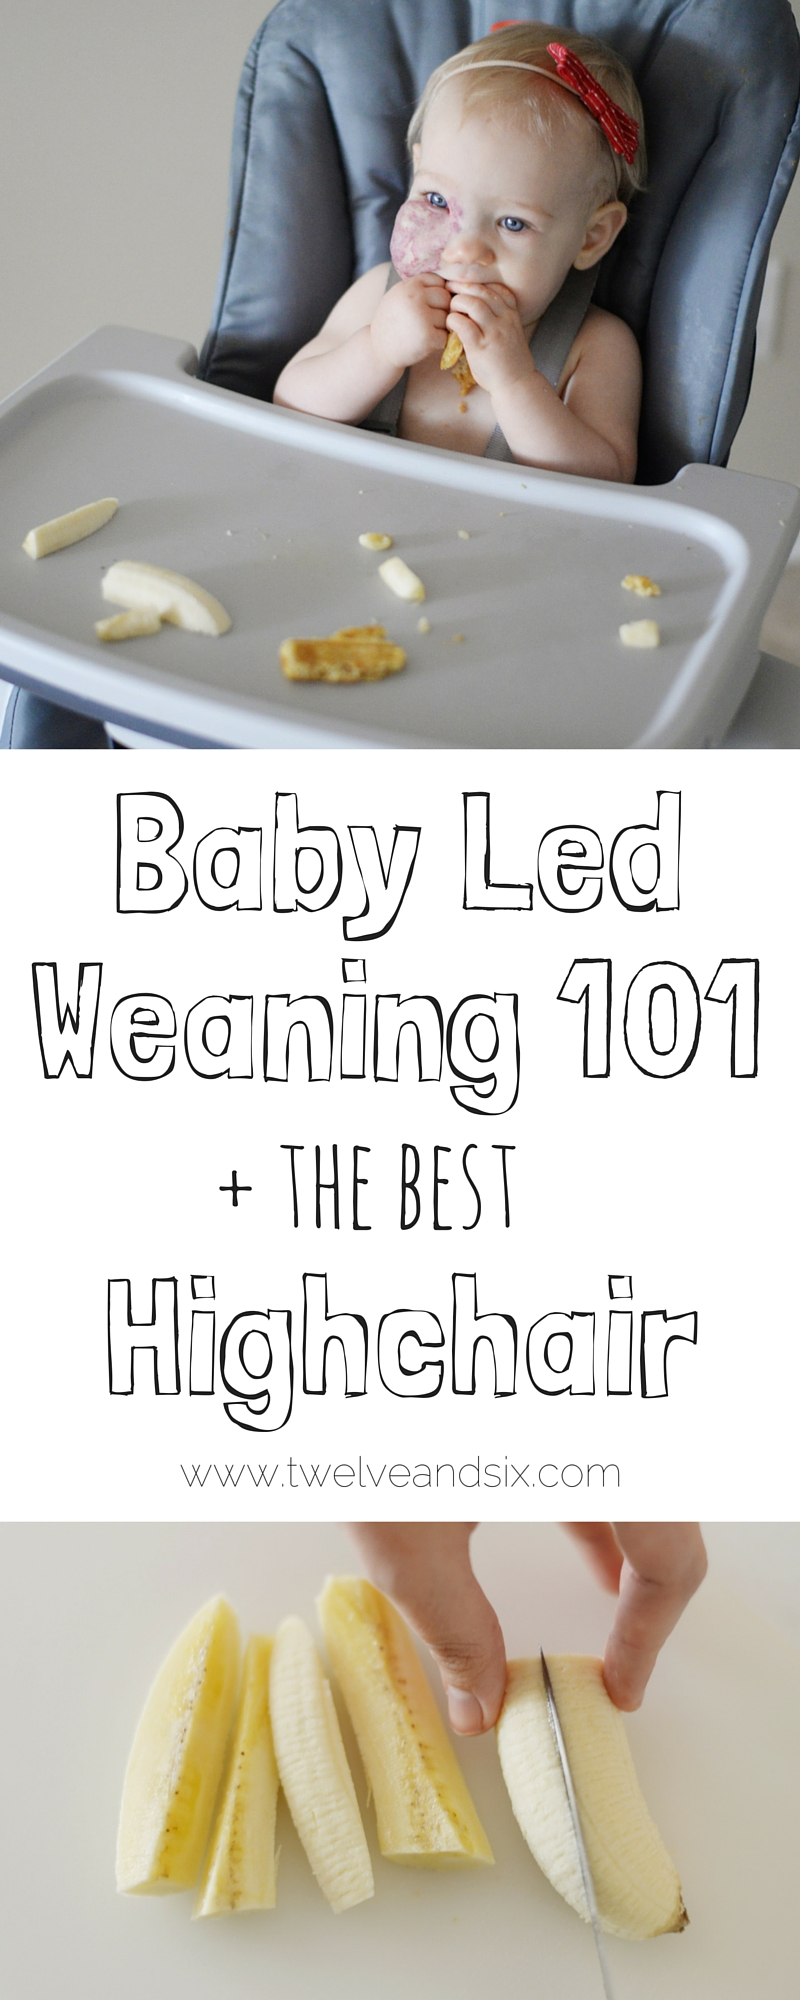 Baby Led Weaning 101